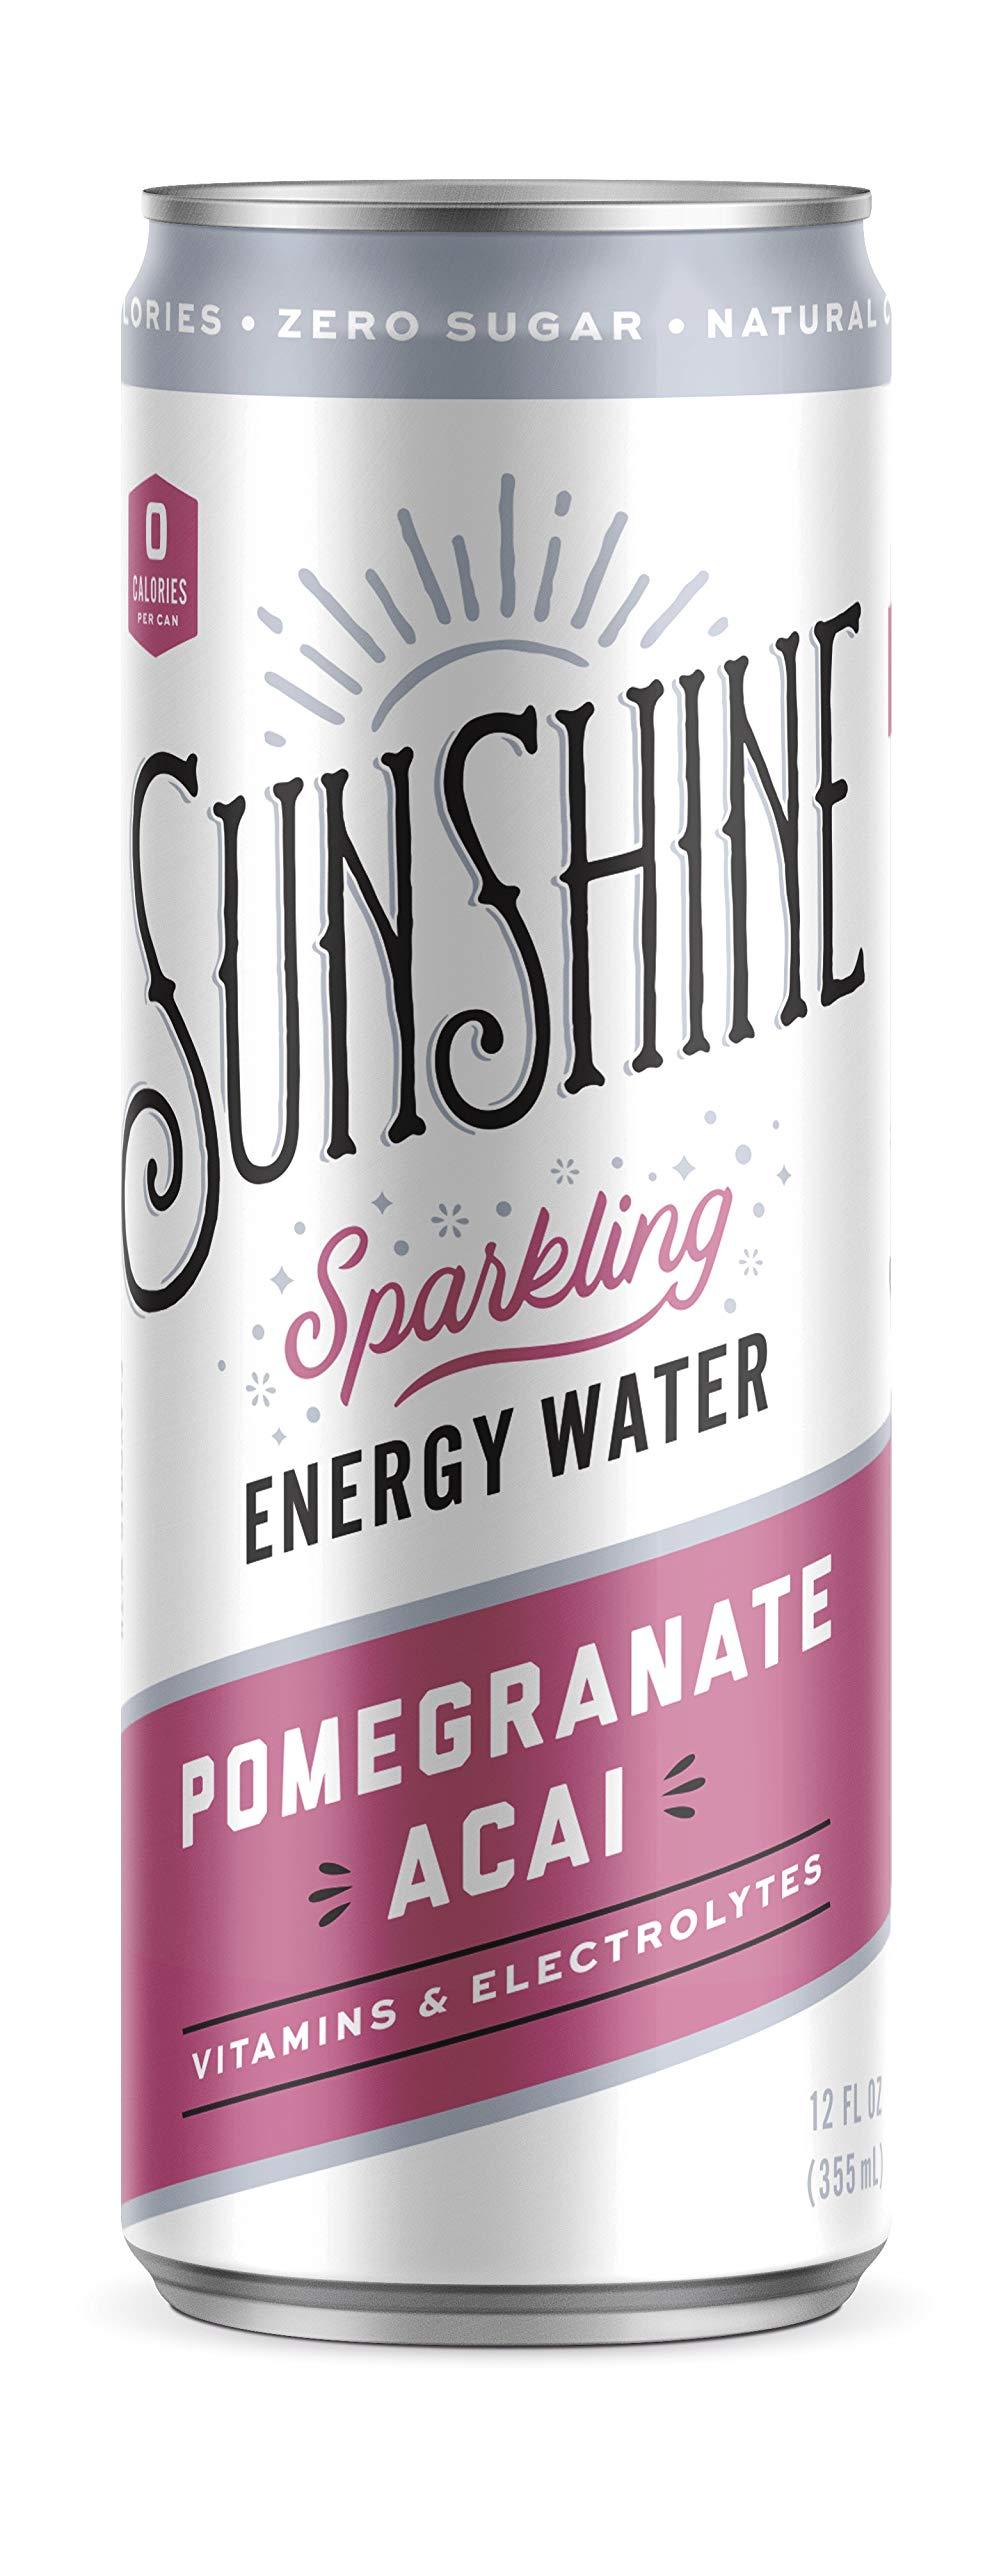 Sunshine Sparkling Energy Waters, Pomegranate Acai, 12 oz (Pack of 12)